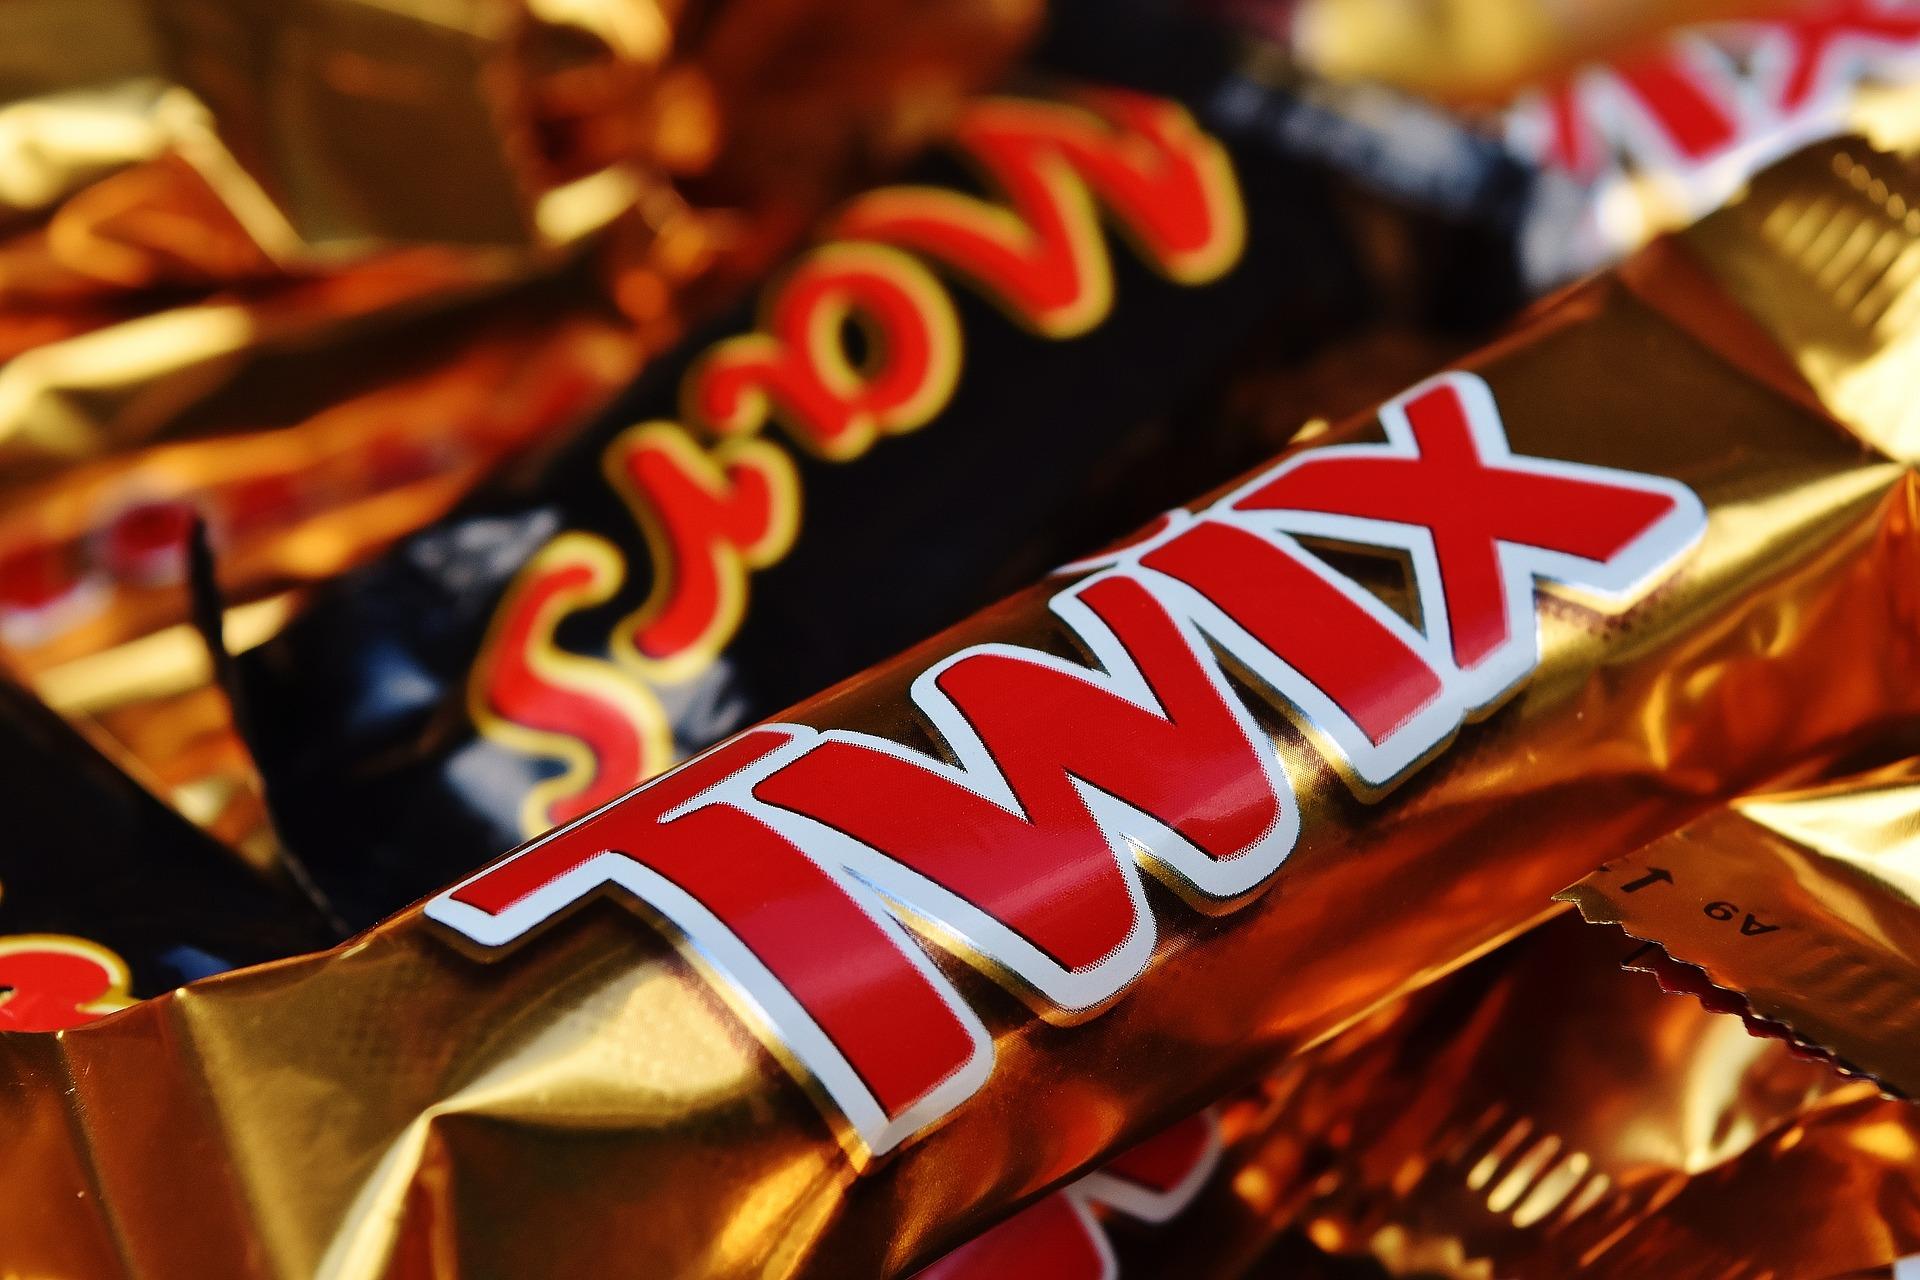 candy-bar-1735651_1920.jpg